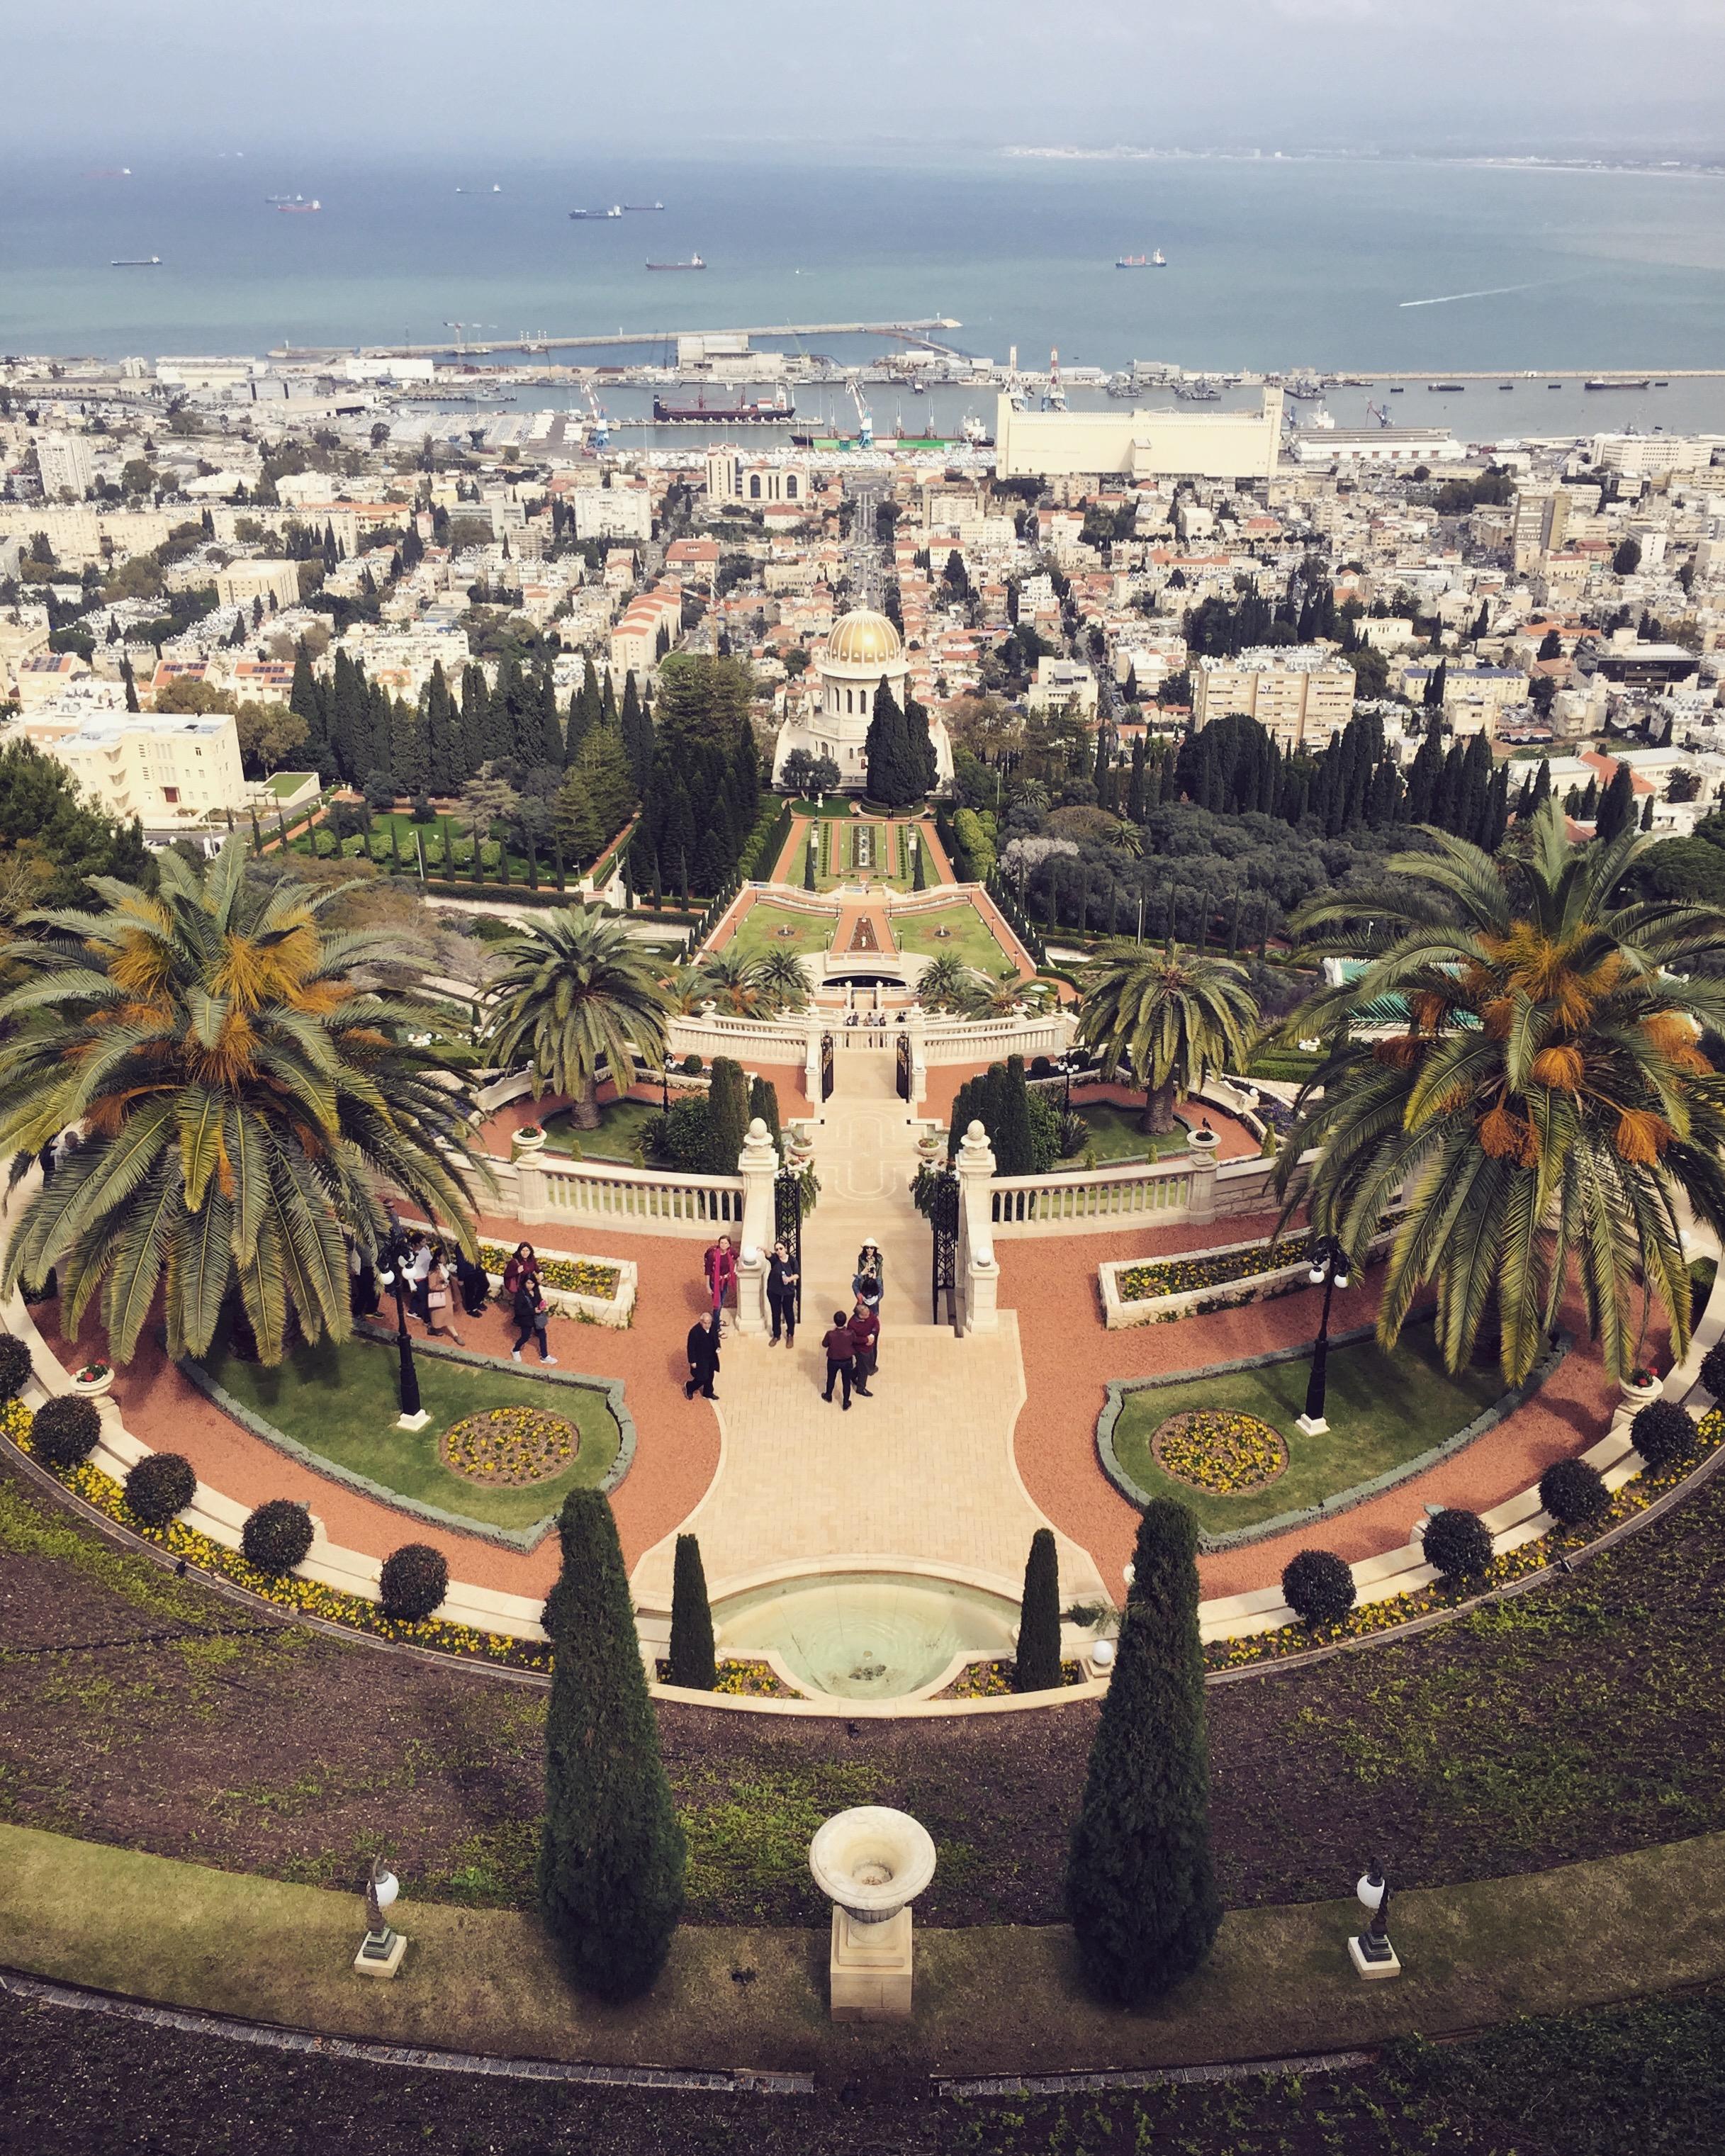 Haifa - Baha'i Gardens